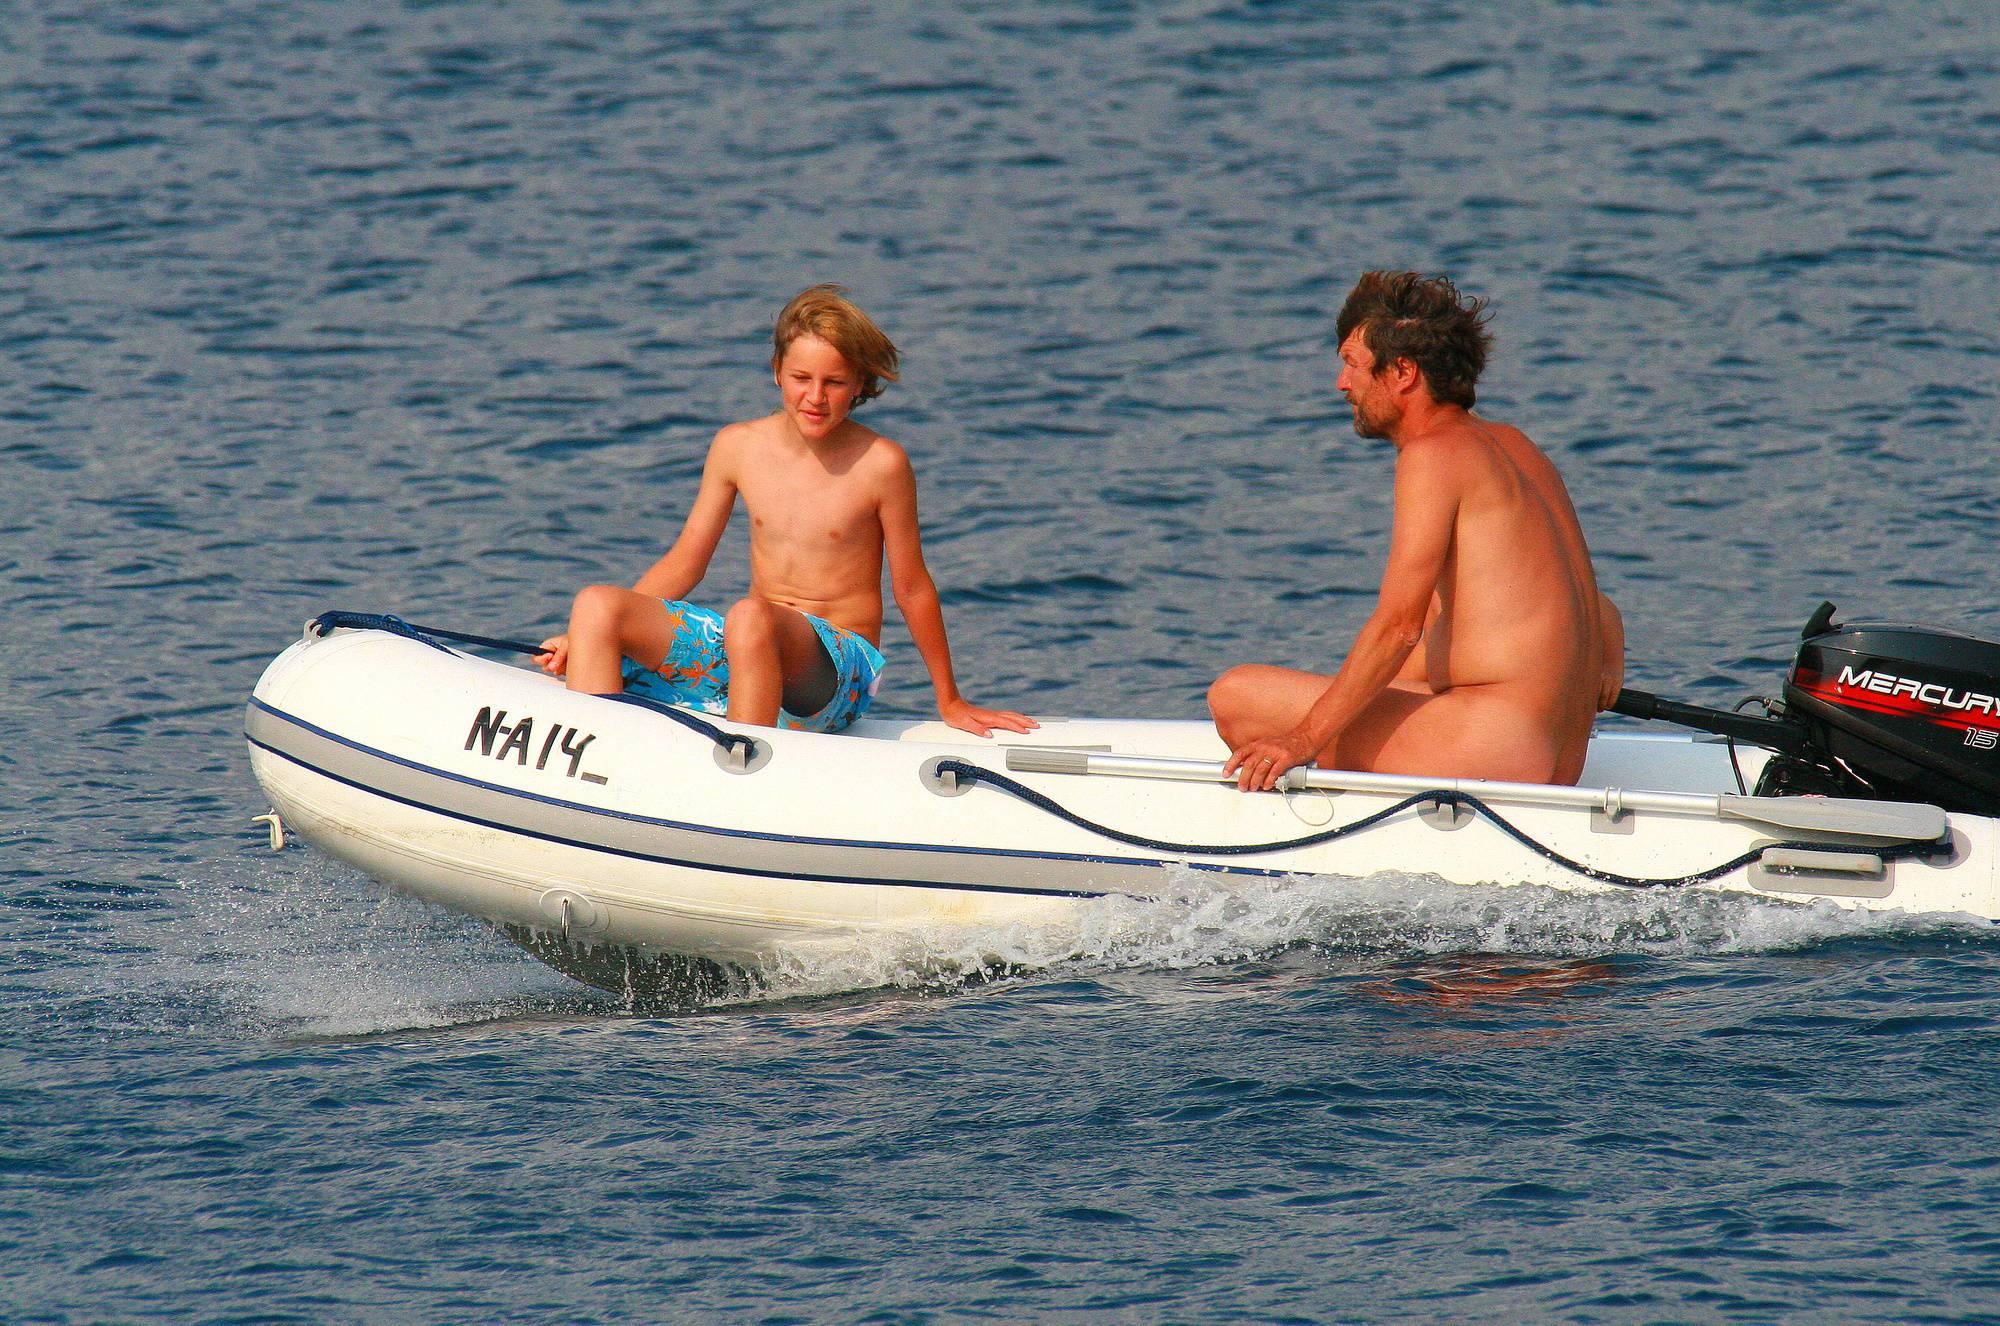 Nudist Pictures Uka FKK In-Water Boating - 2